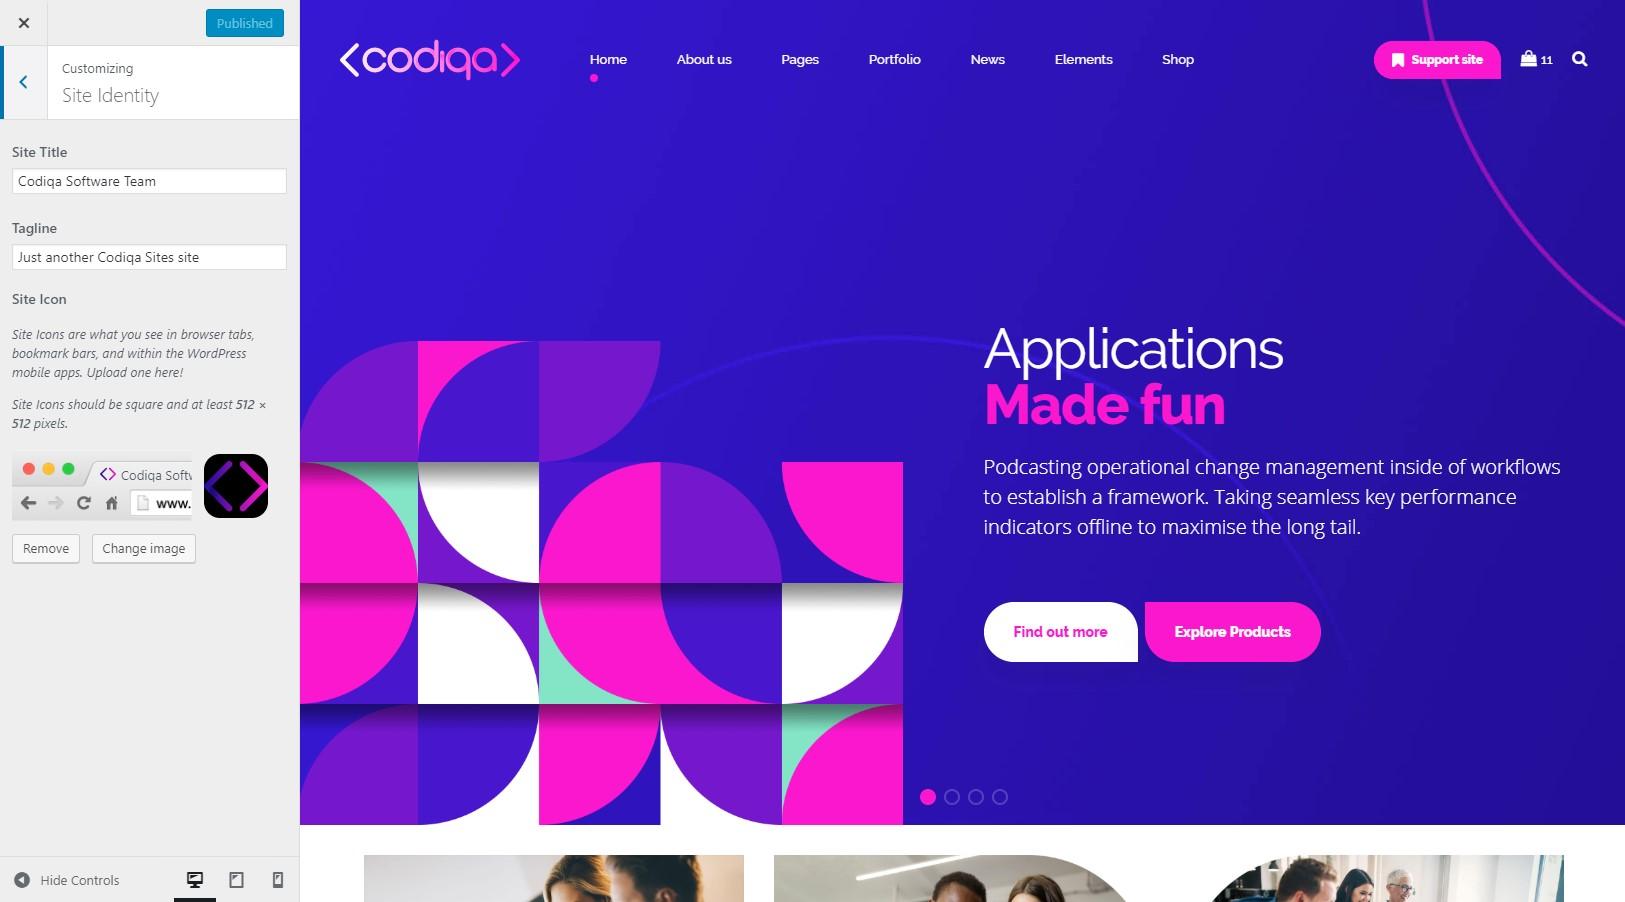 https://documentation.bold-themes.com/codiqa/wp-content/uploads/sites/49/2019/10/site-identity.jpg